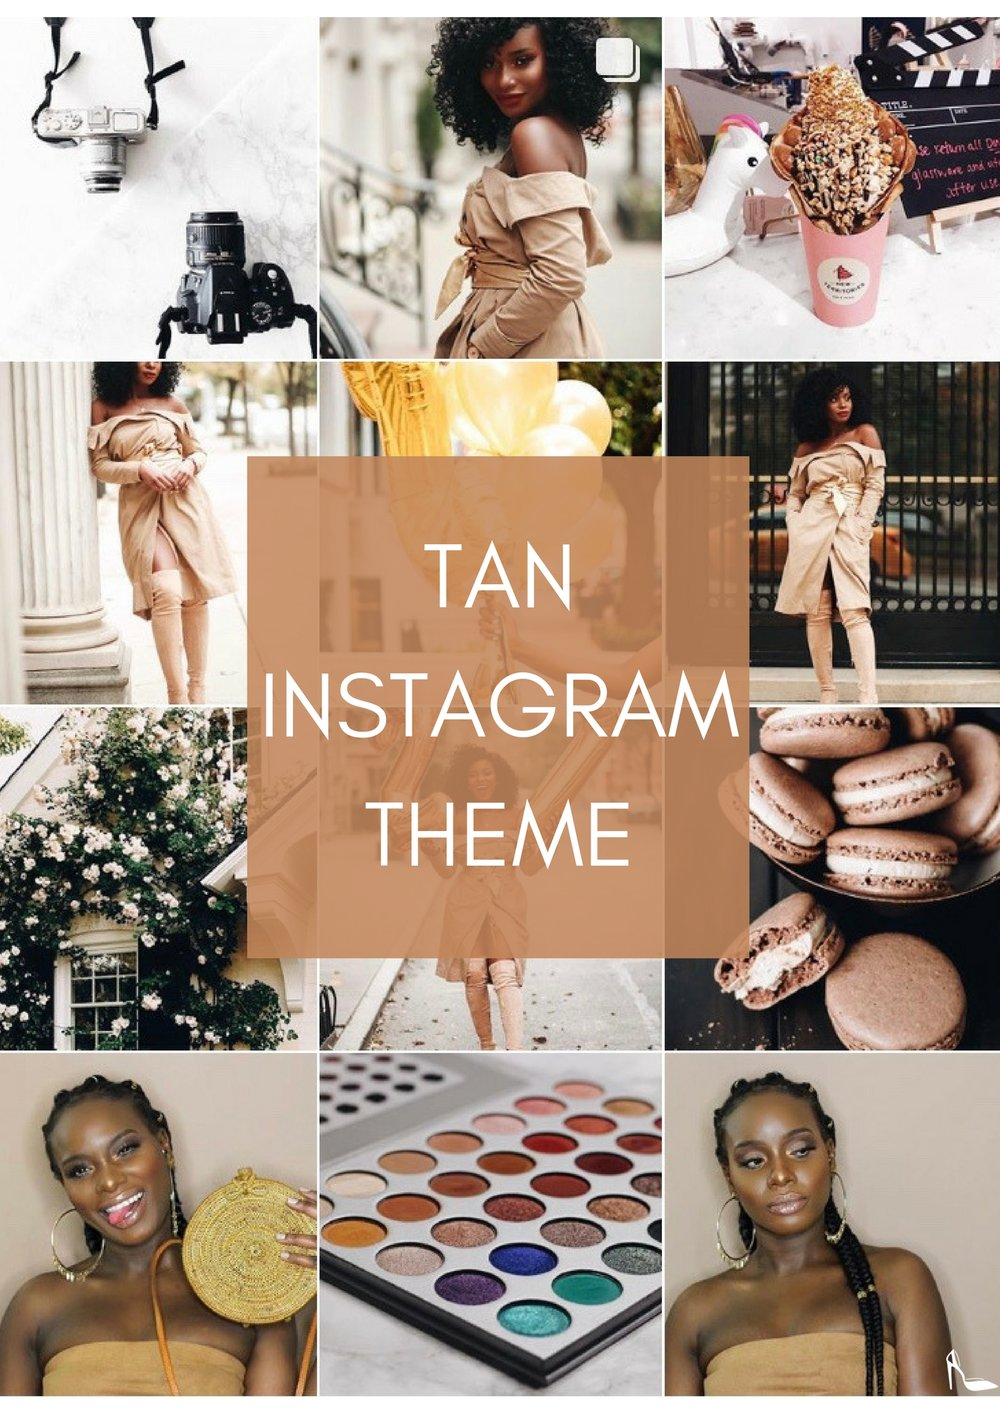 TAN-INSTAGRAM-THEME